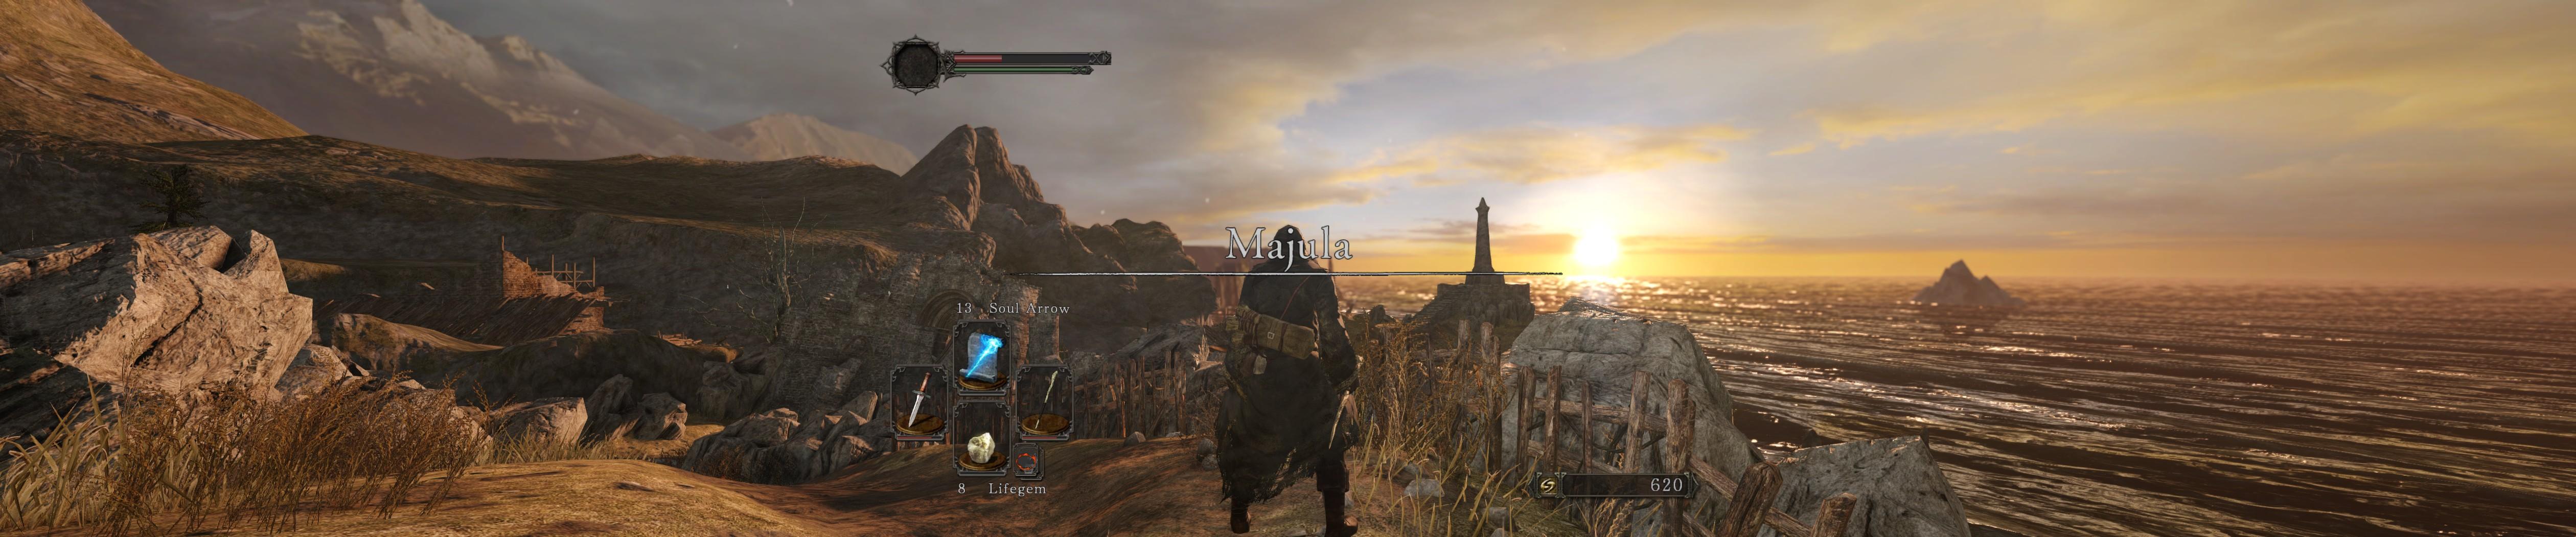 Dark Souls Ii Triple Monitors Eyefinity Surround 4k Wsgf